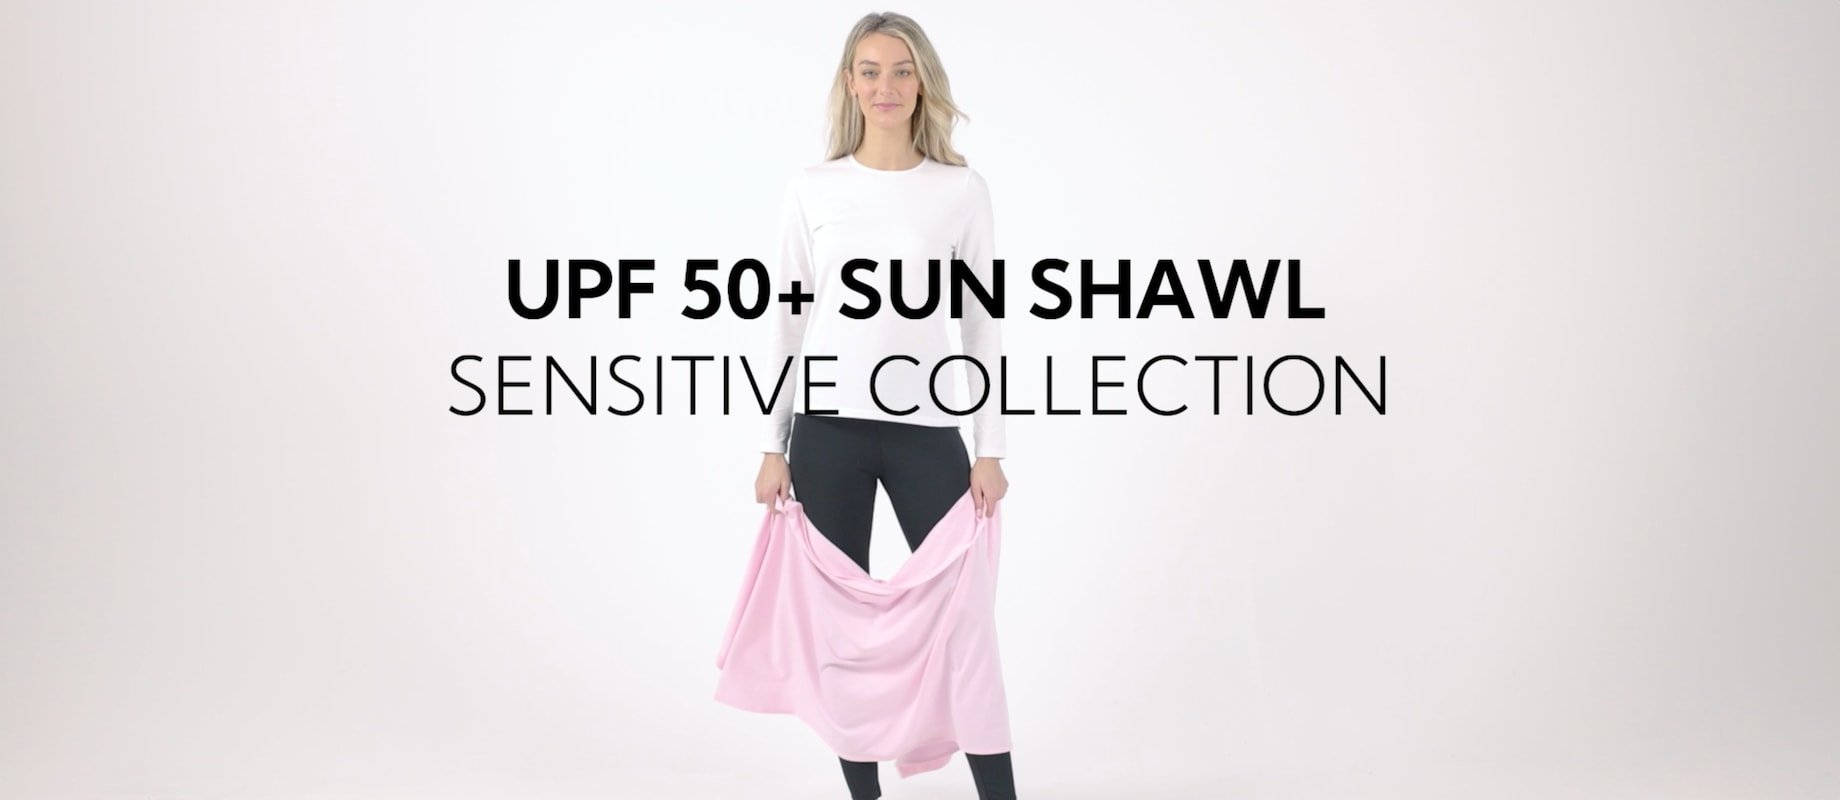 UPF50+ Sun Protective Shawl For Women | Max UV Protection